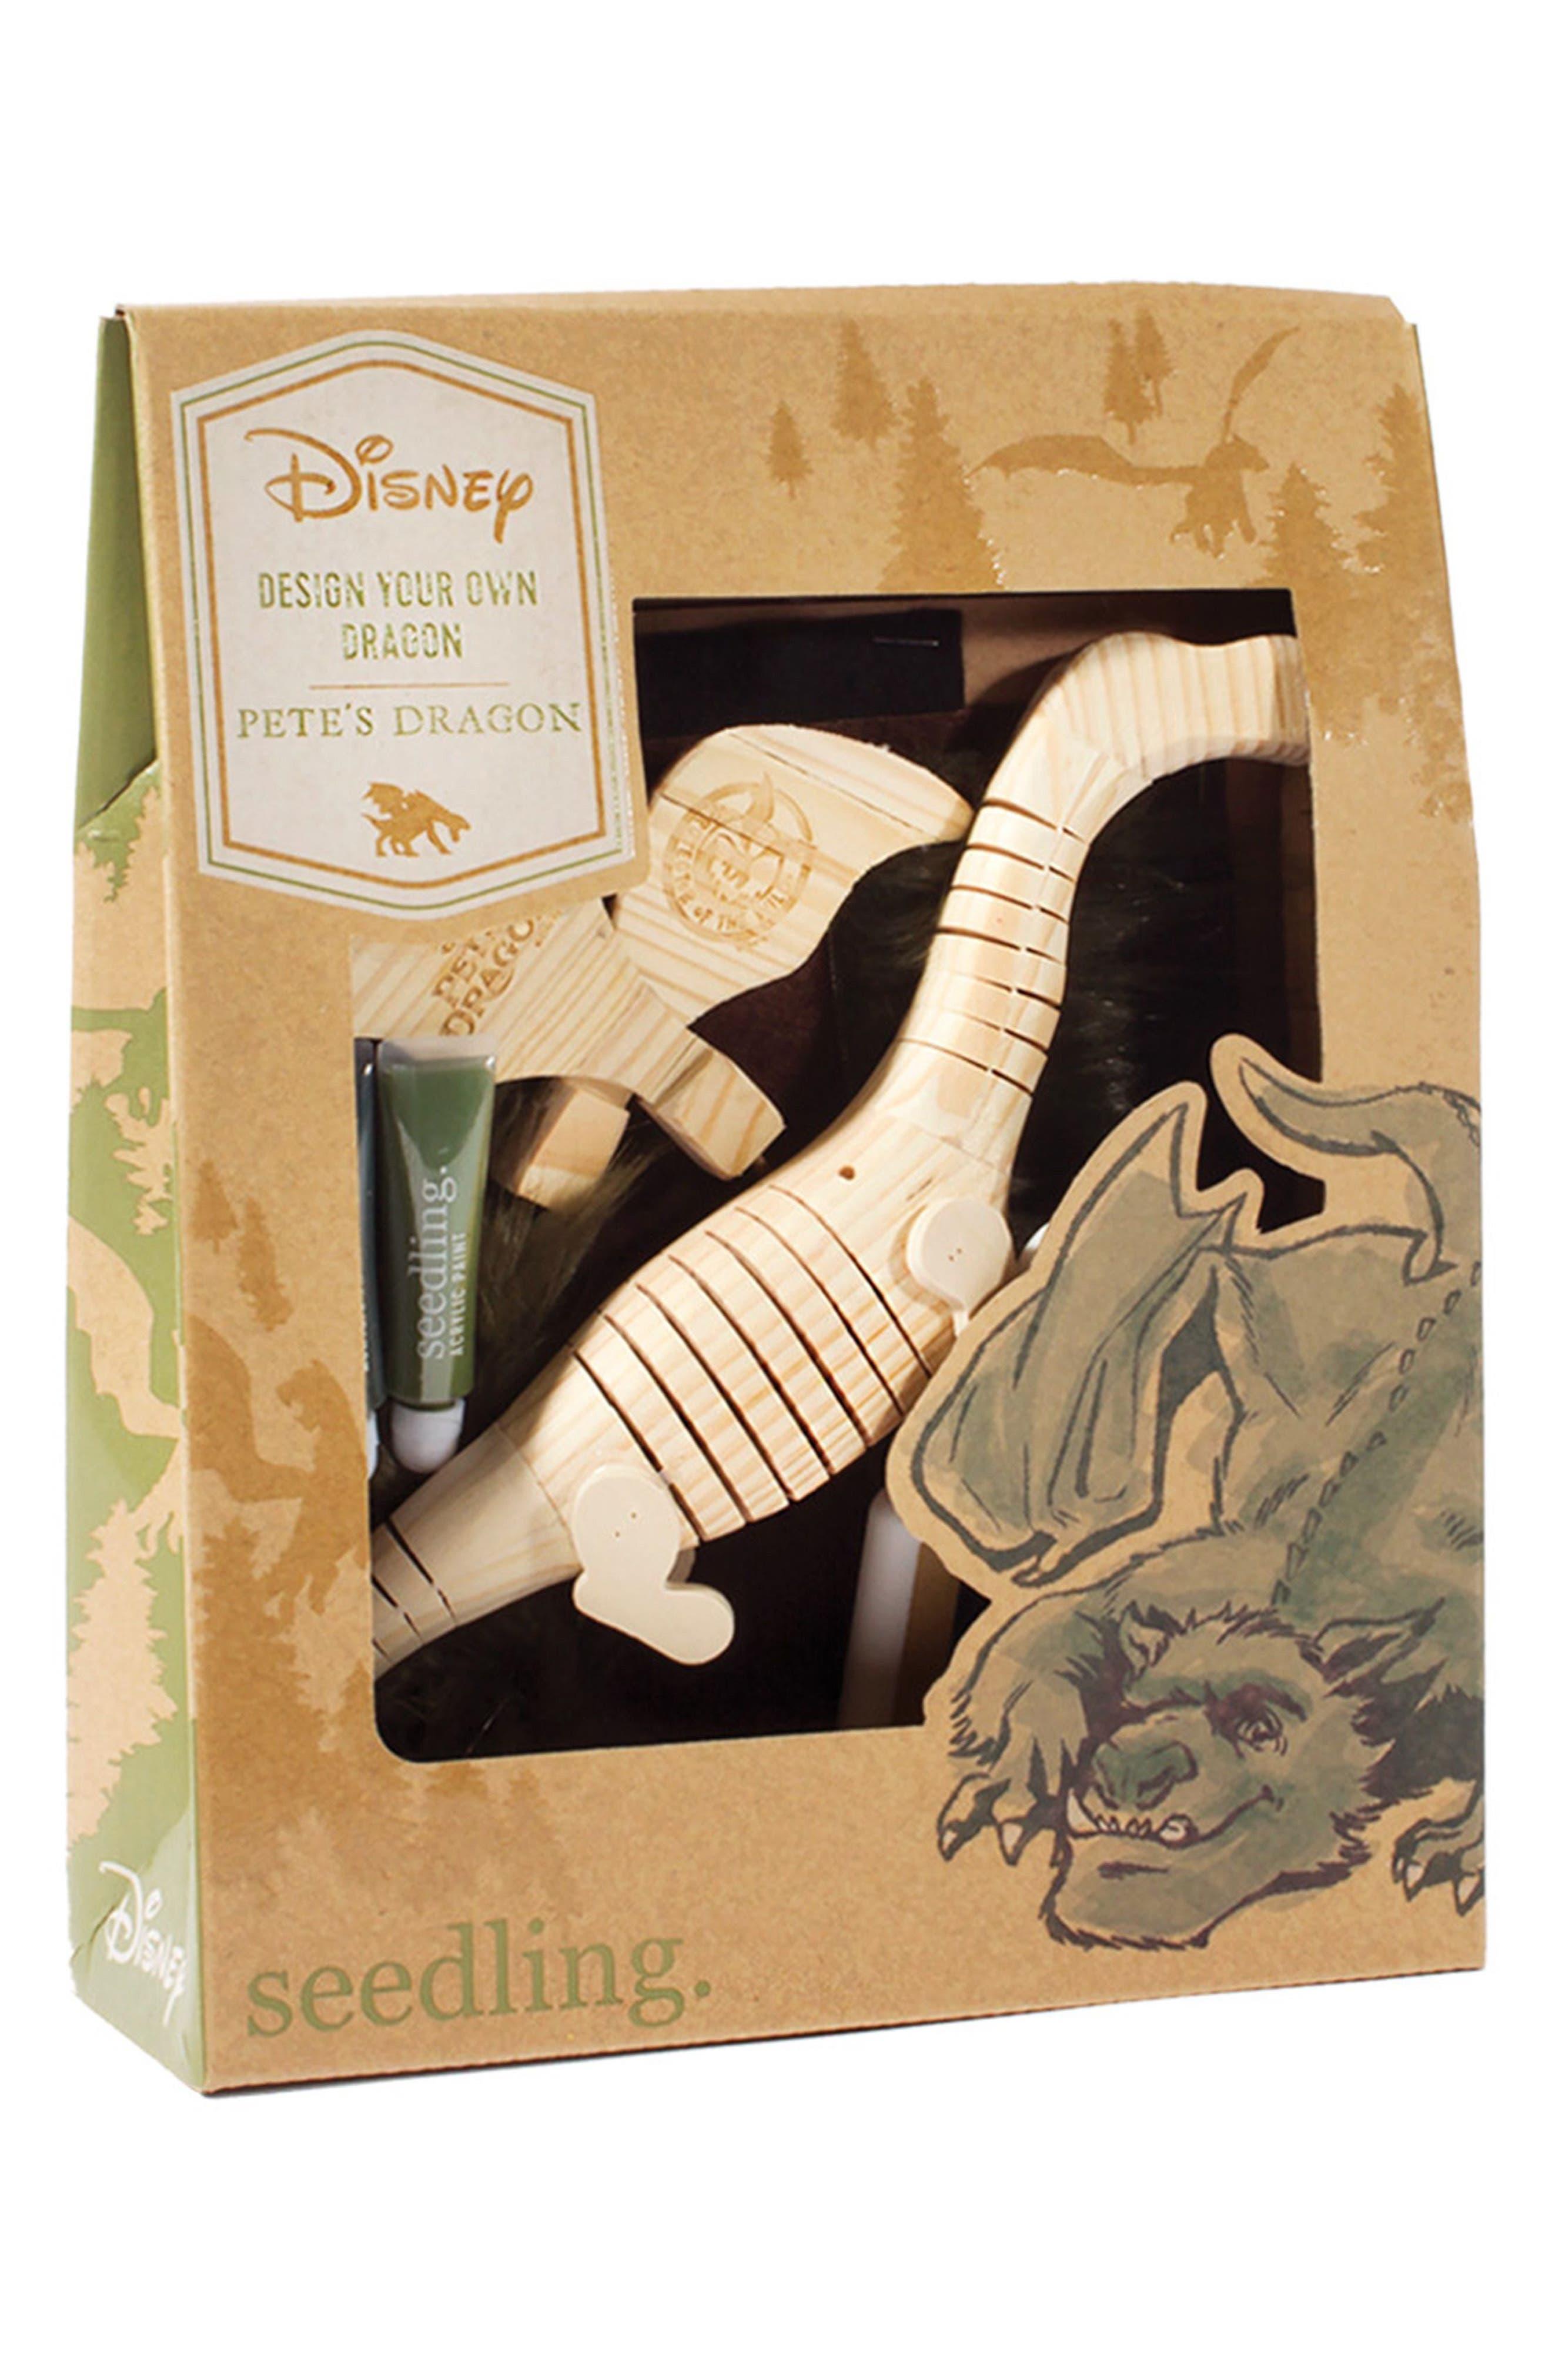 seedling Disney's Pete's Dragon Design Your Own Dragon Craft Kit